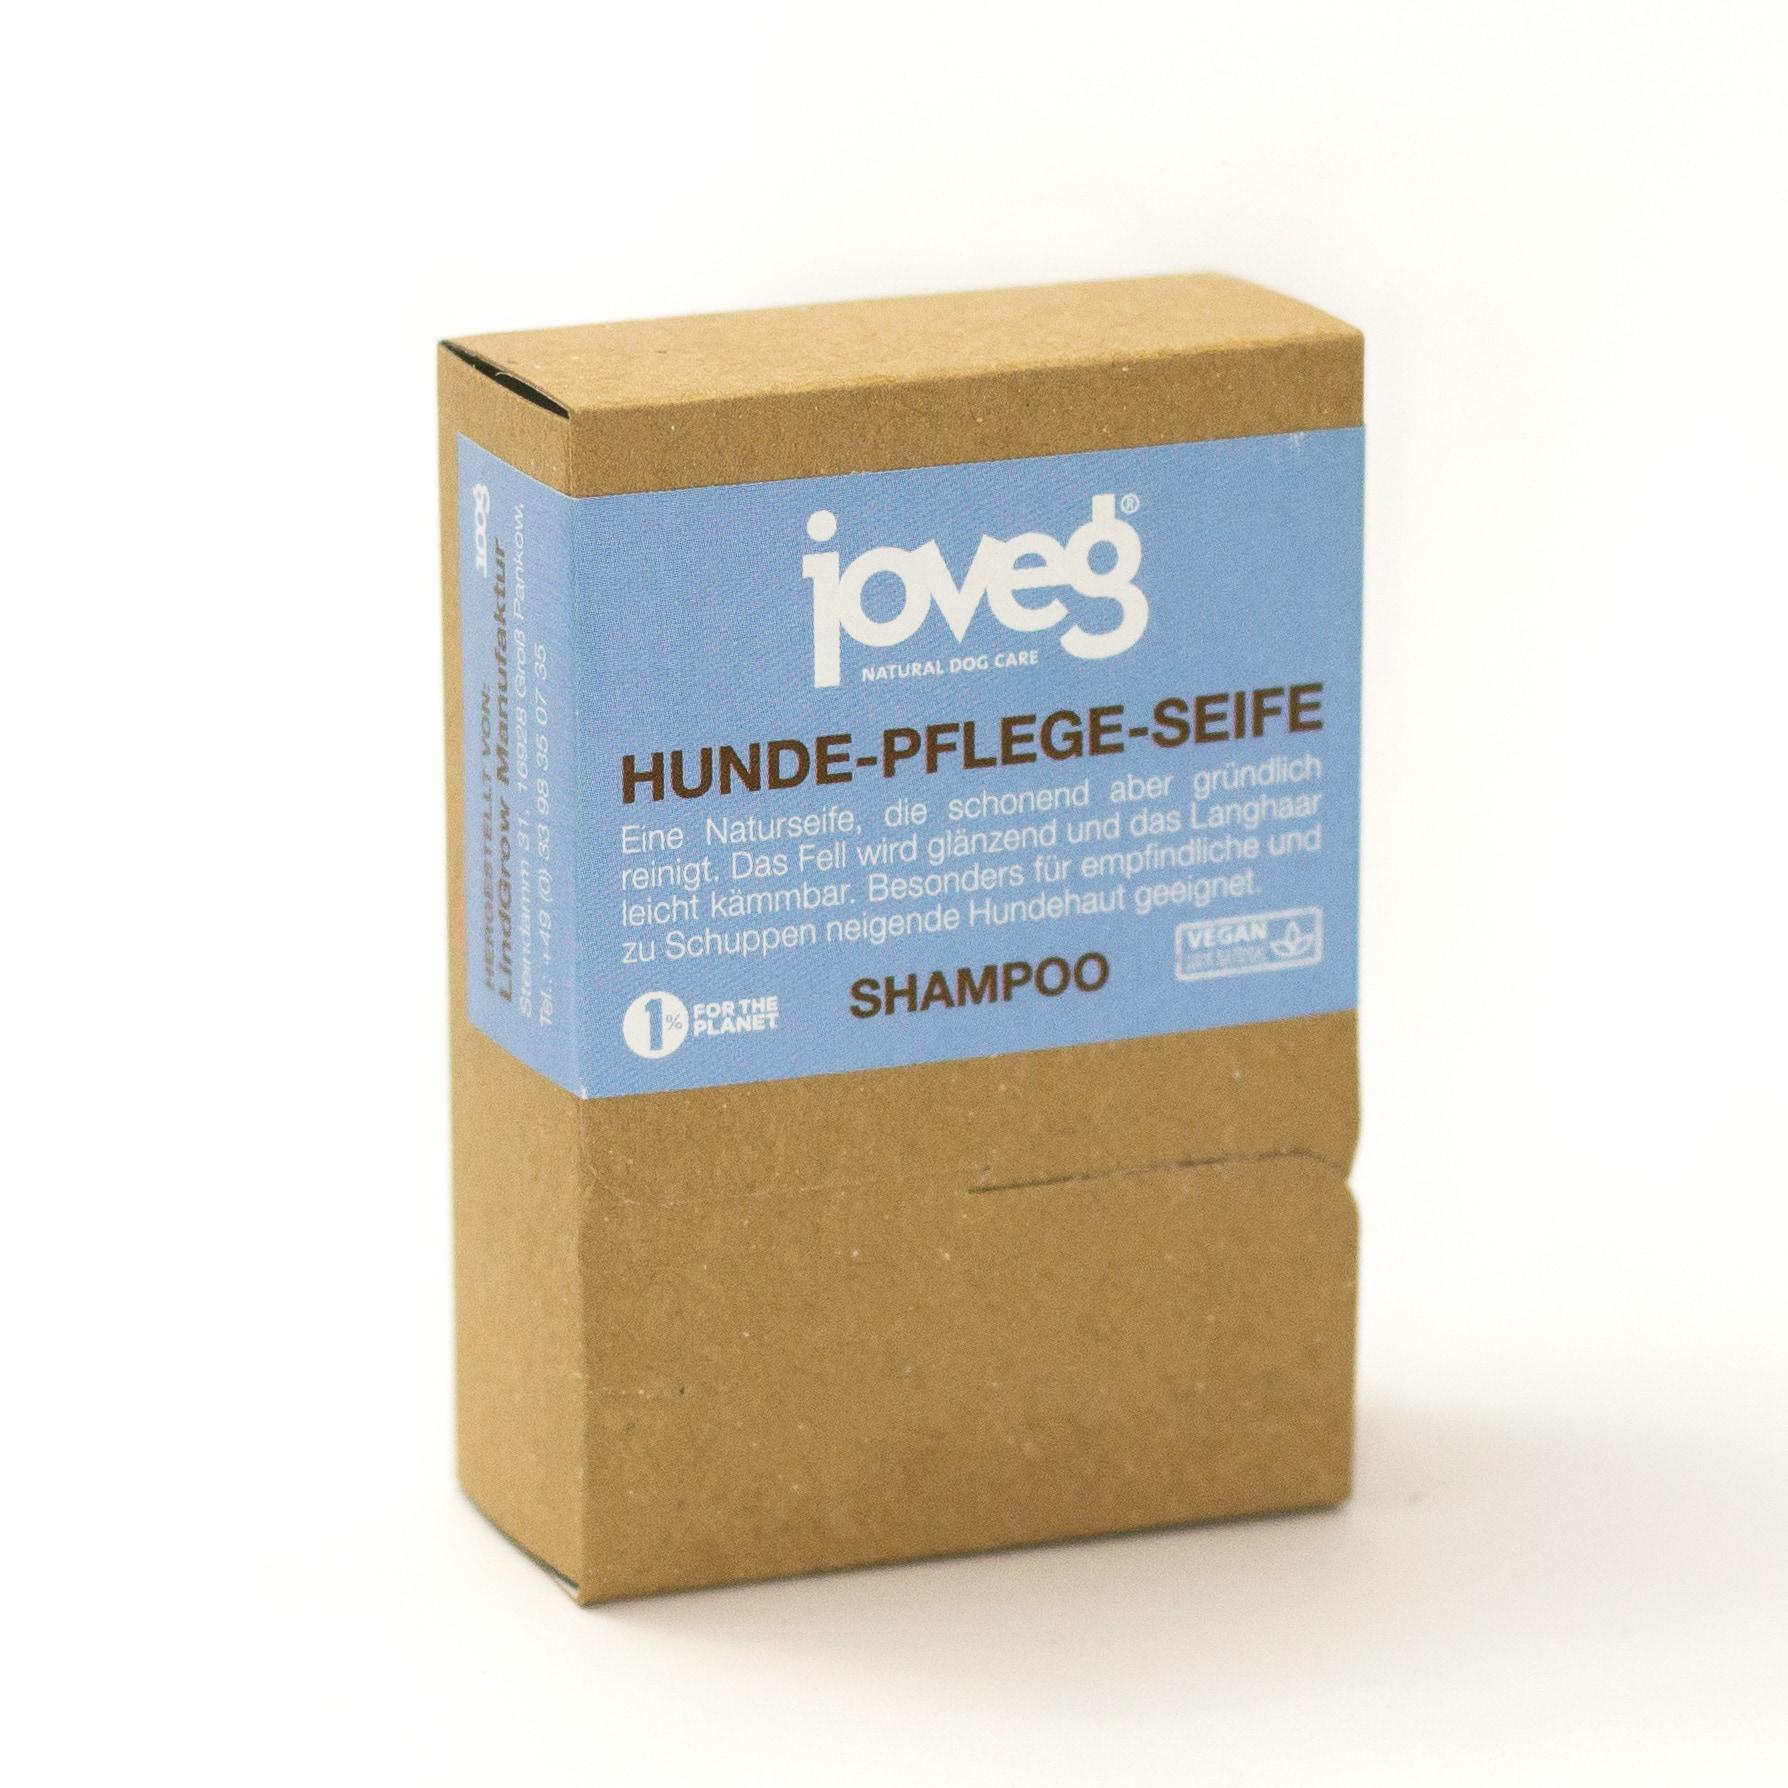 "joveg Hunde-Pflege-Seife ""SHAMPOO"" 100 g"